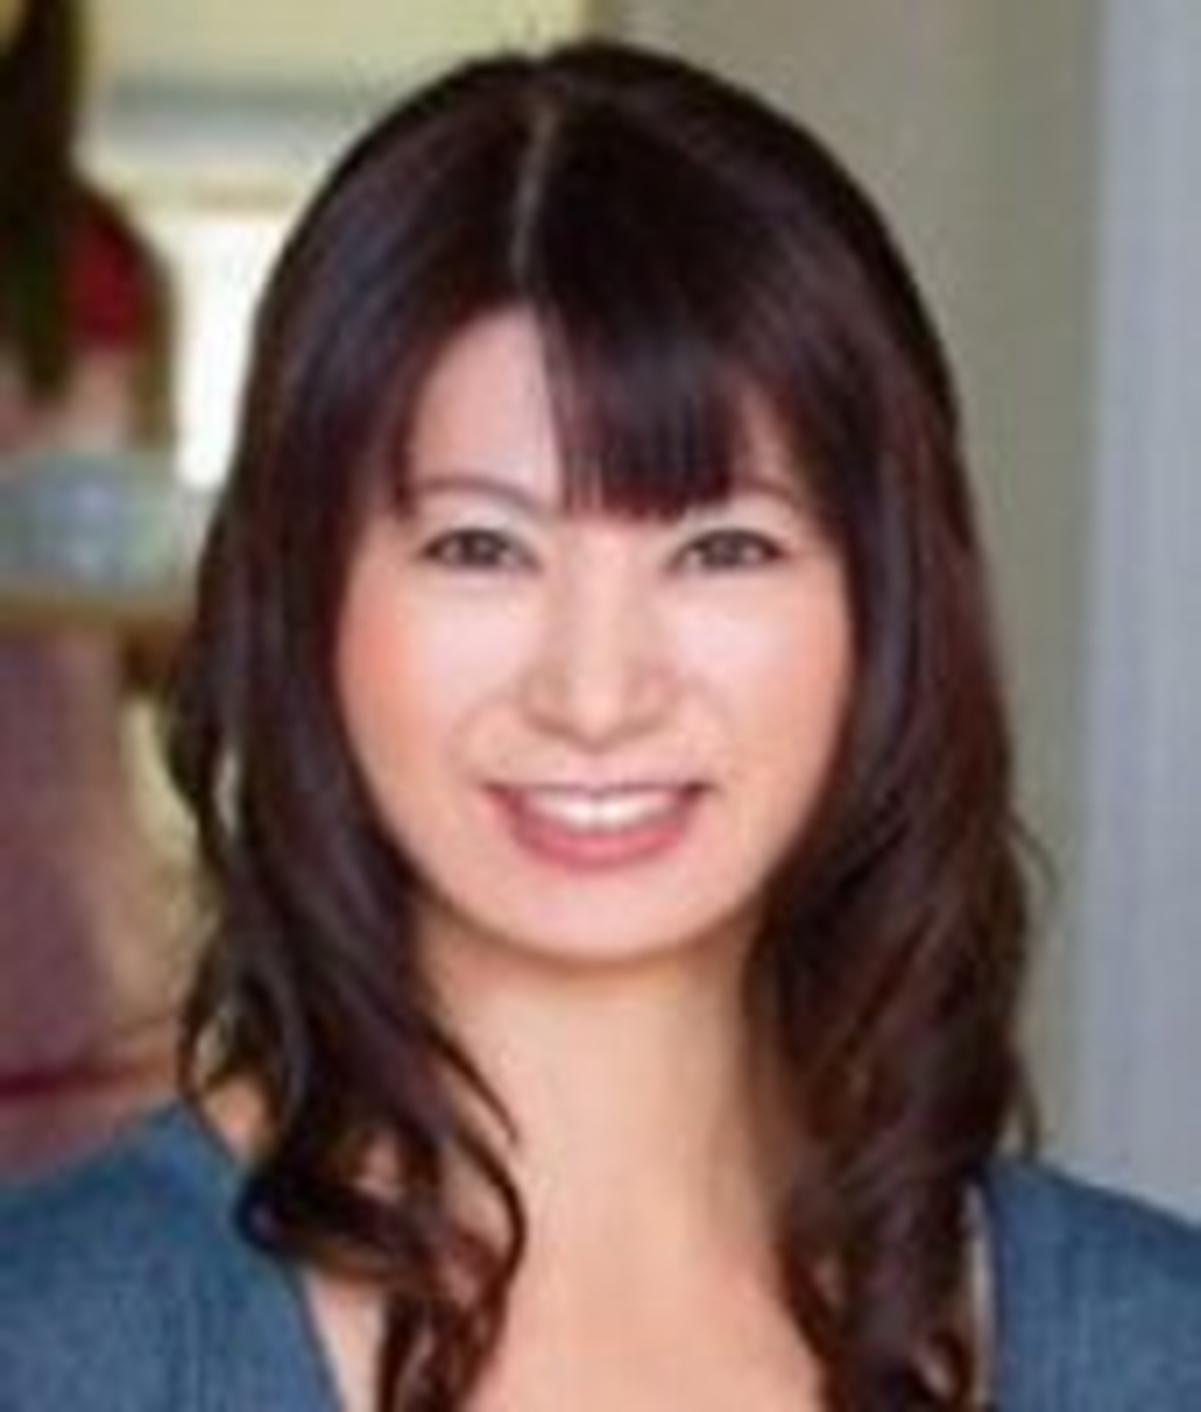 Naomi Sugawara